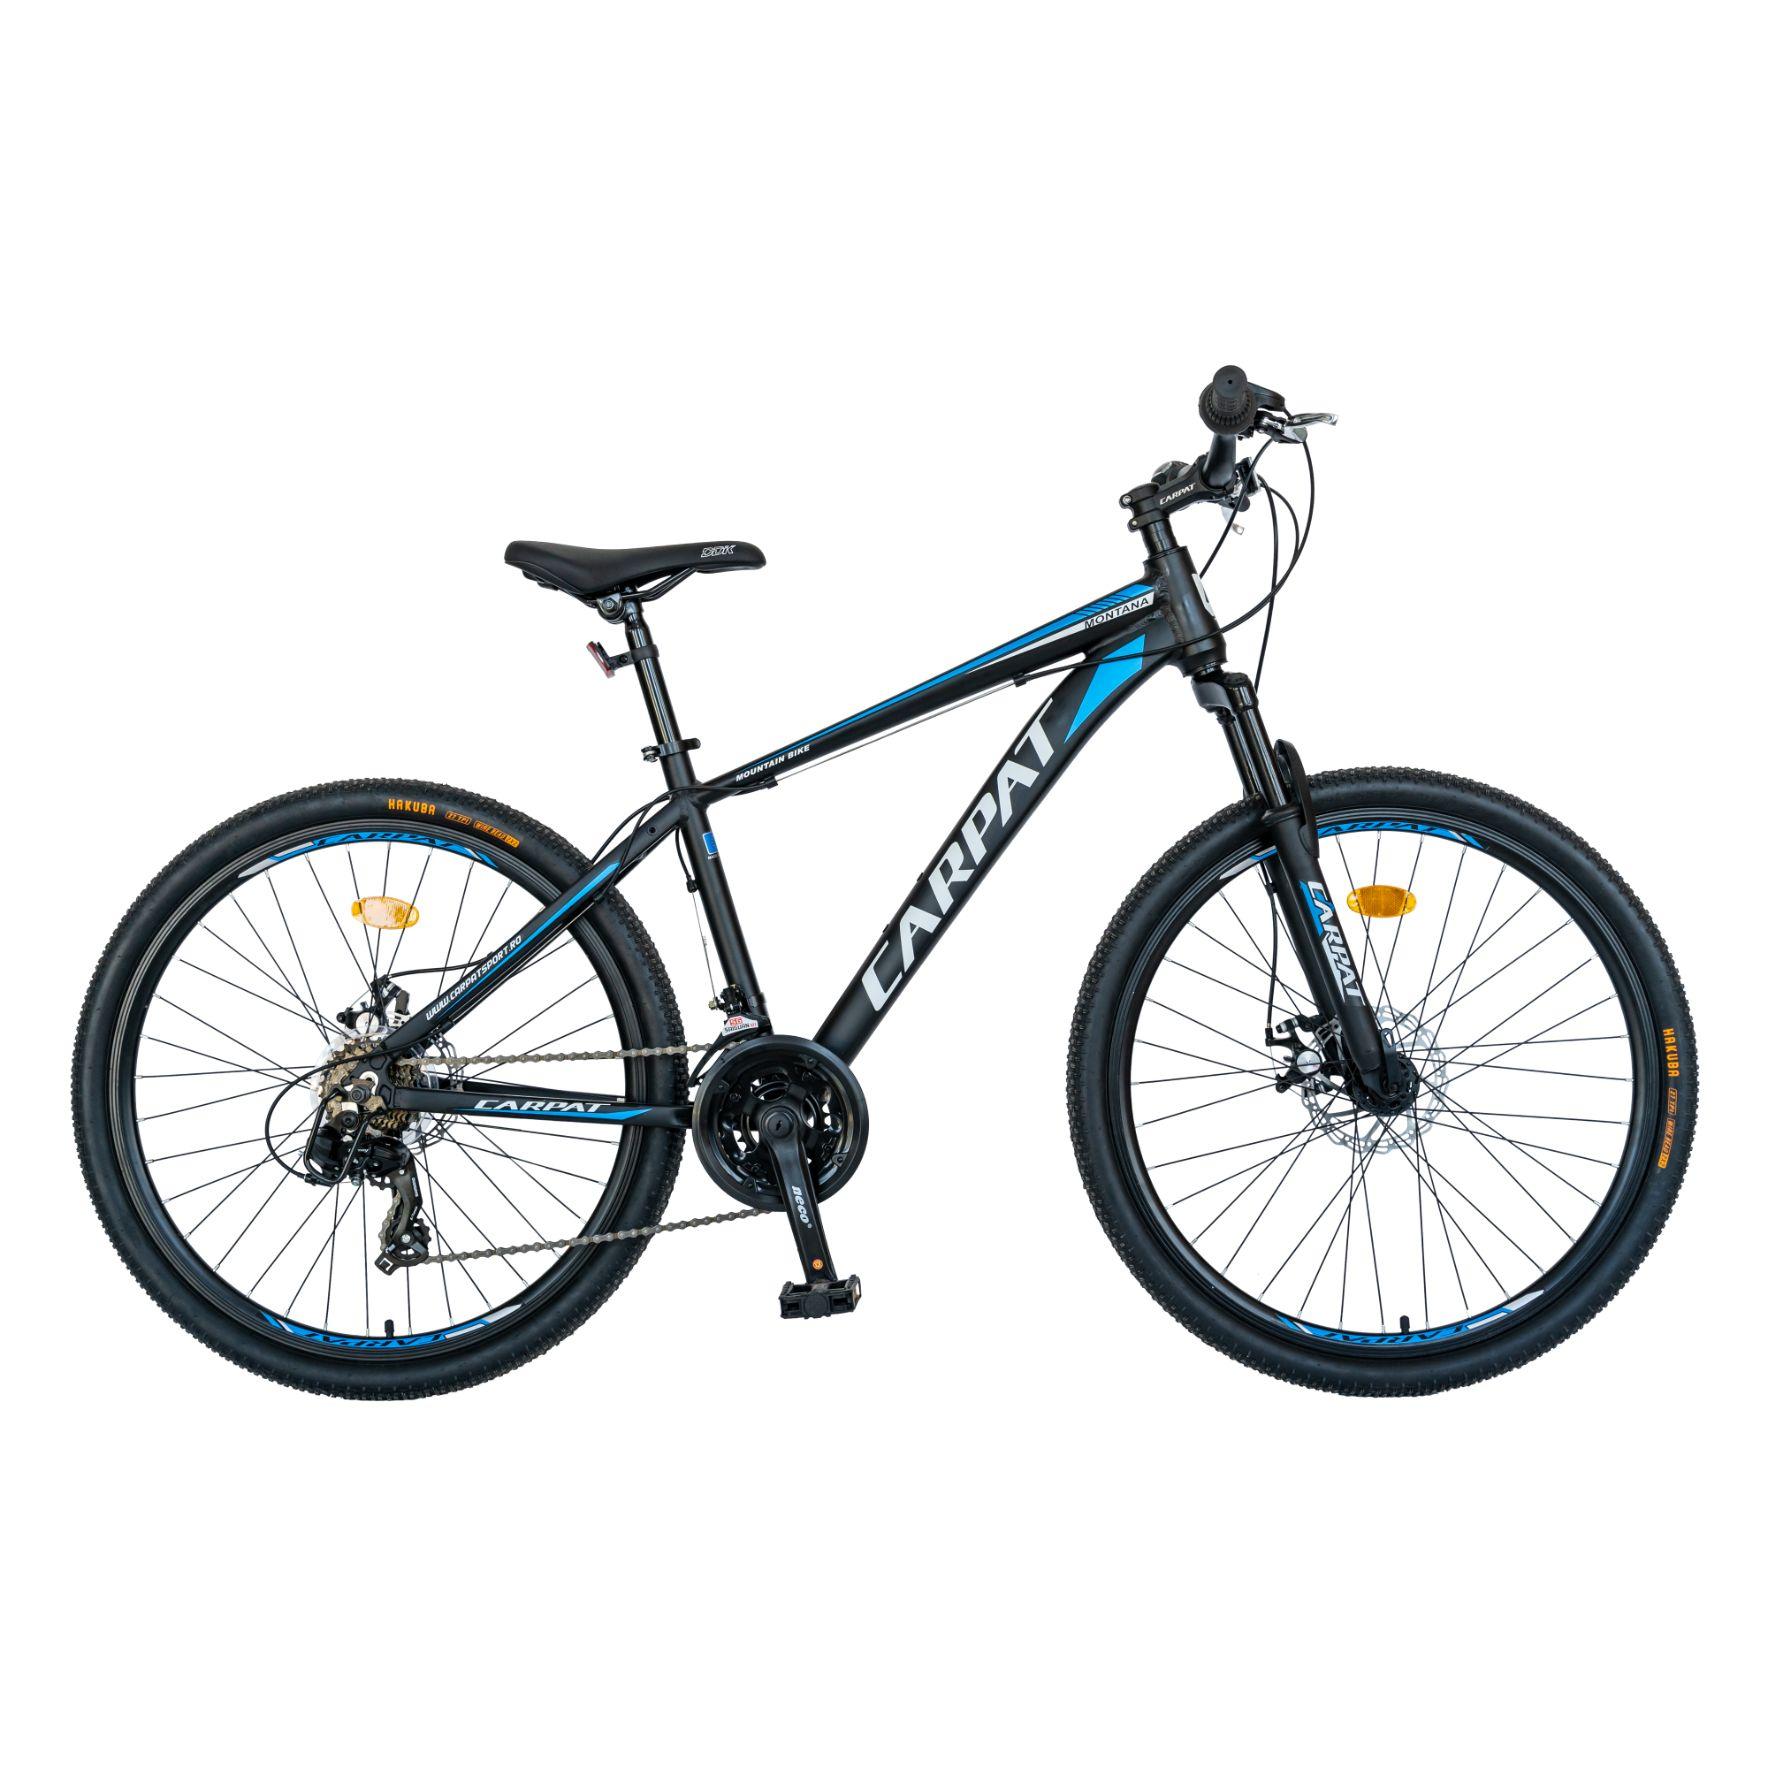 "Fotografie Bicicleta MTB 26"" Carpat C2699A, Negru/Albastru/Alb"